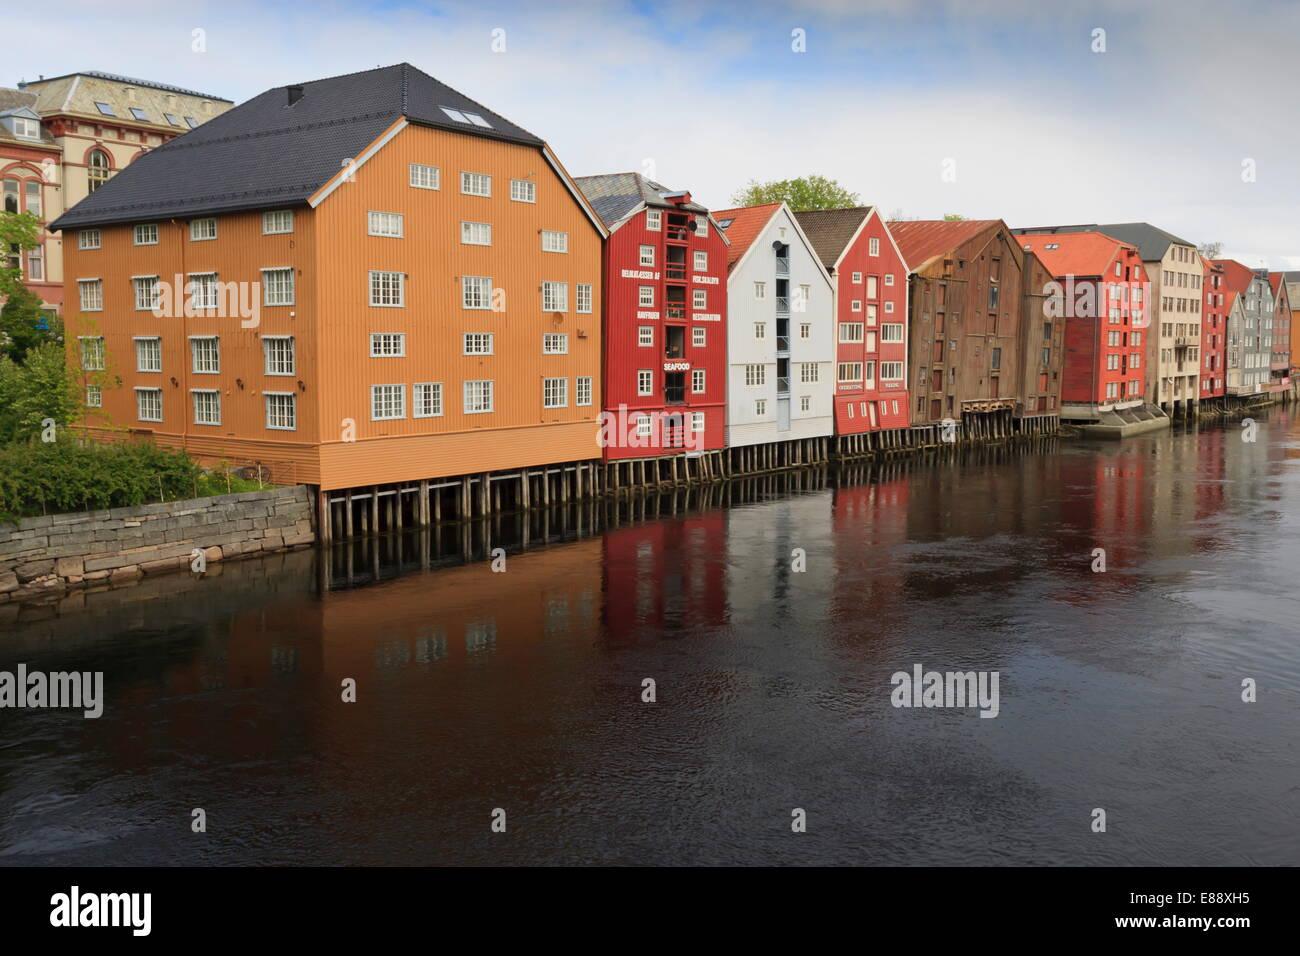 Colourful wooden warehouses on wharf beside the Nidelva River, Trondheim, Sor-Trondelag, Norway, Scandinavia, Europe - Stock Image